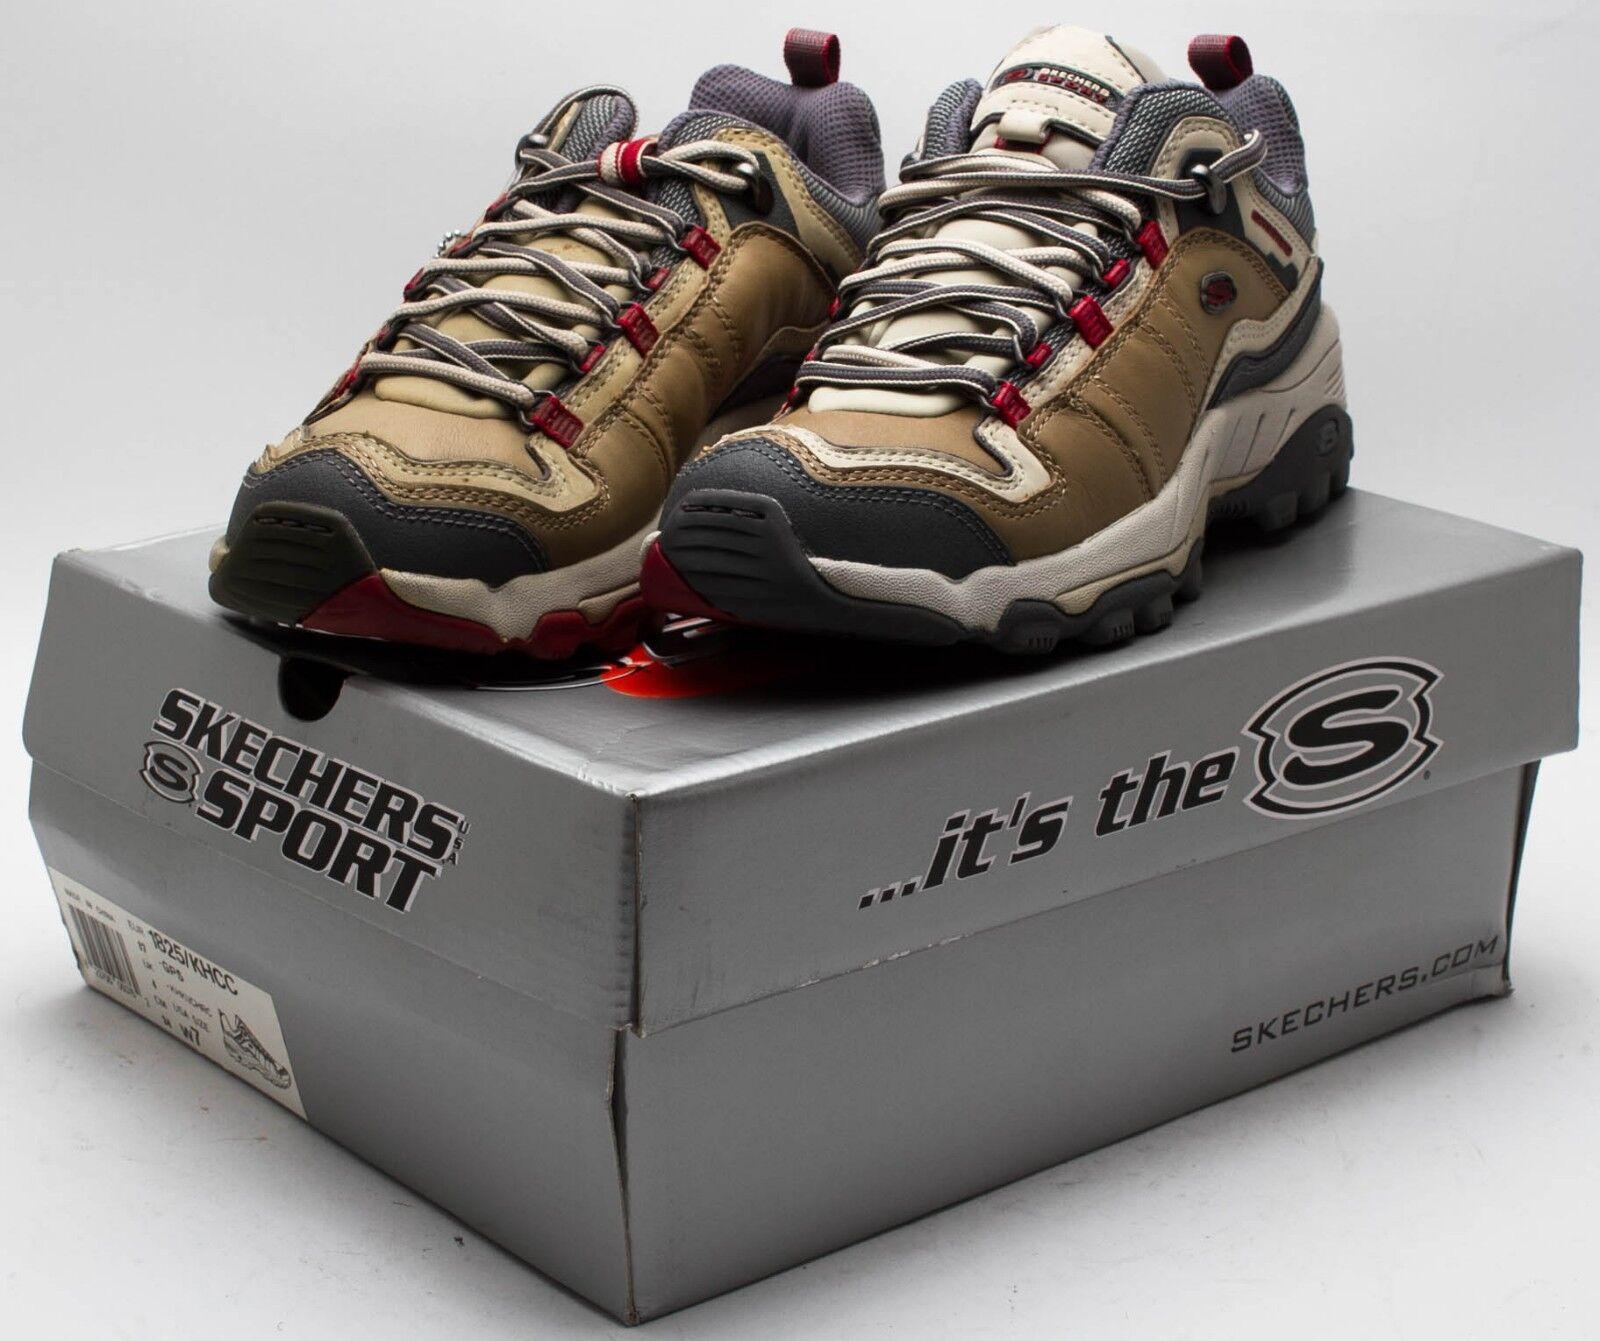 Skechers Women's Vintage 2002 Sport Trail Hiking shoes 1825 KHCC Tan Red sz. W9